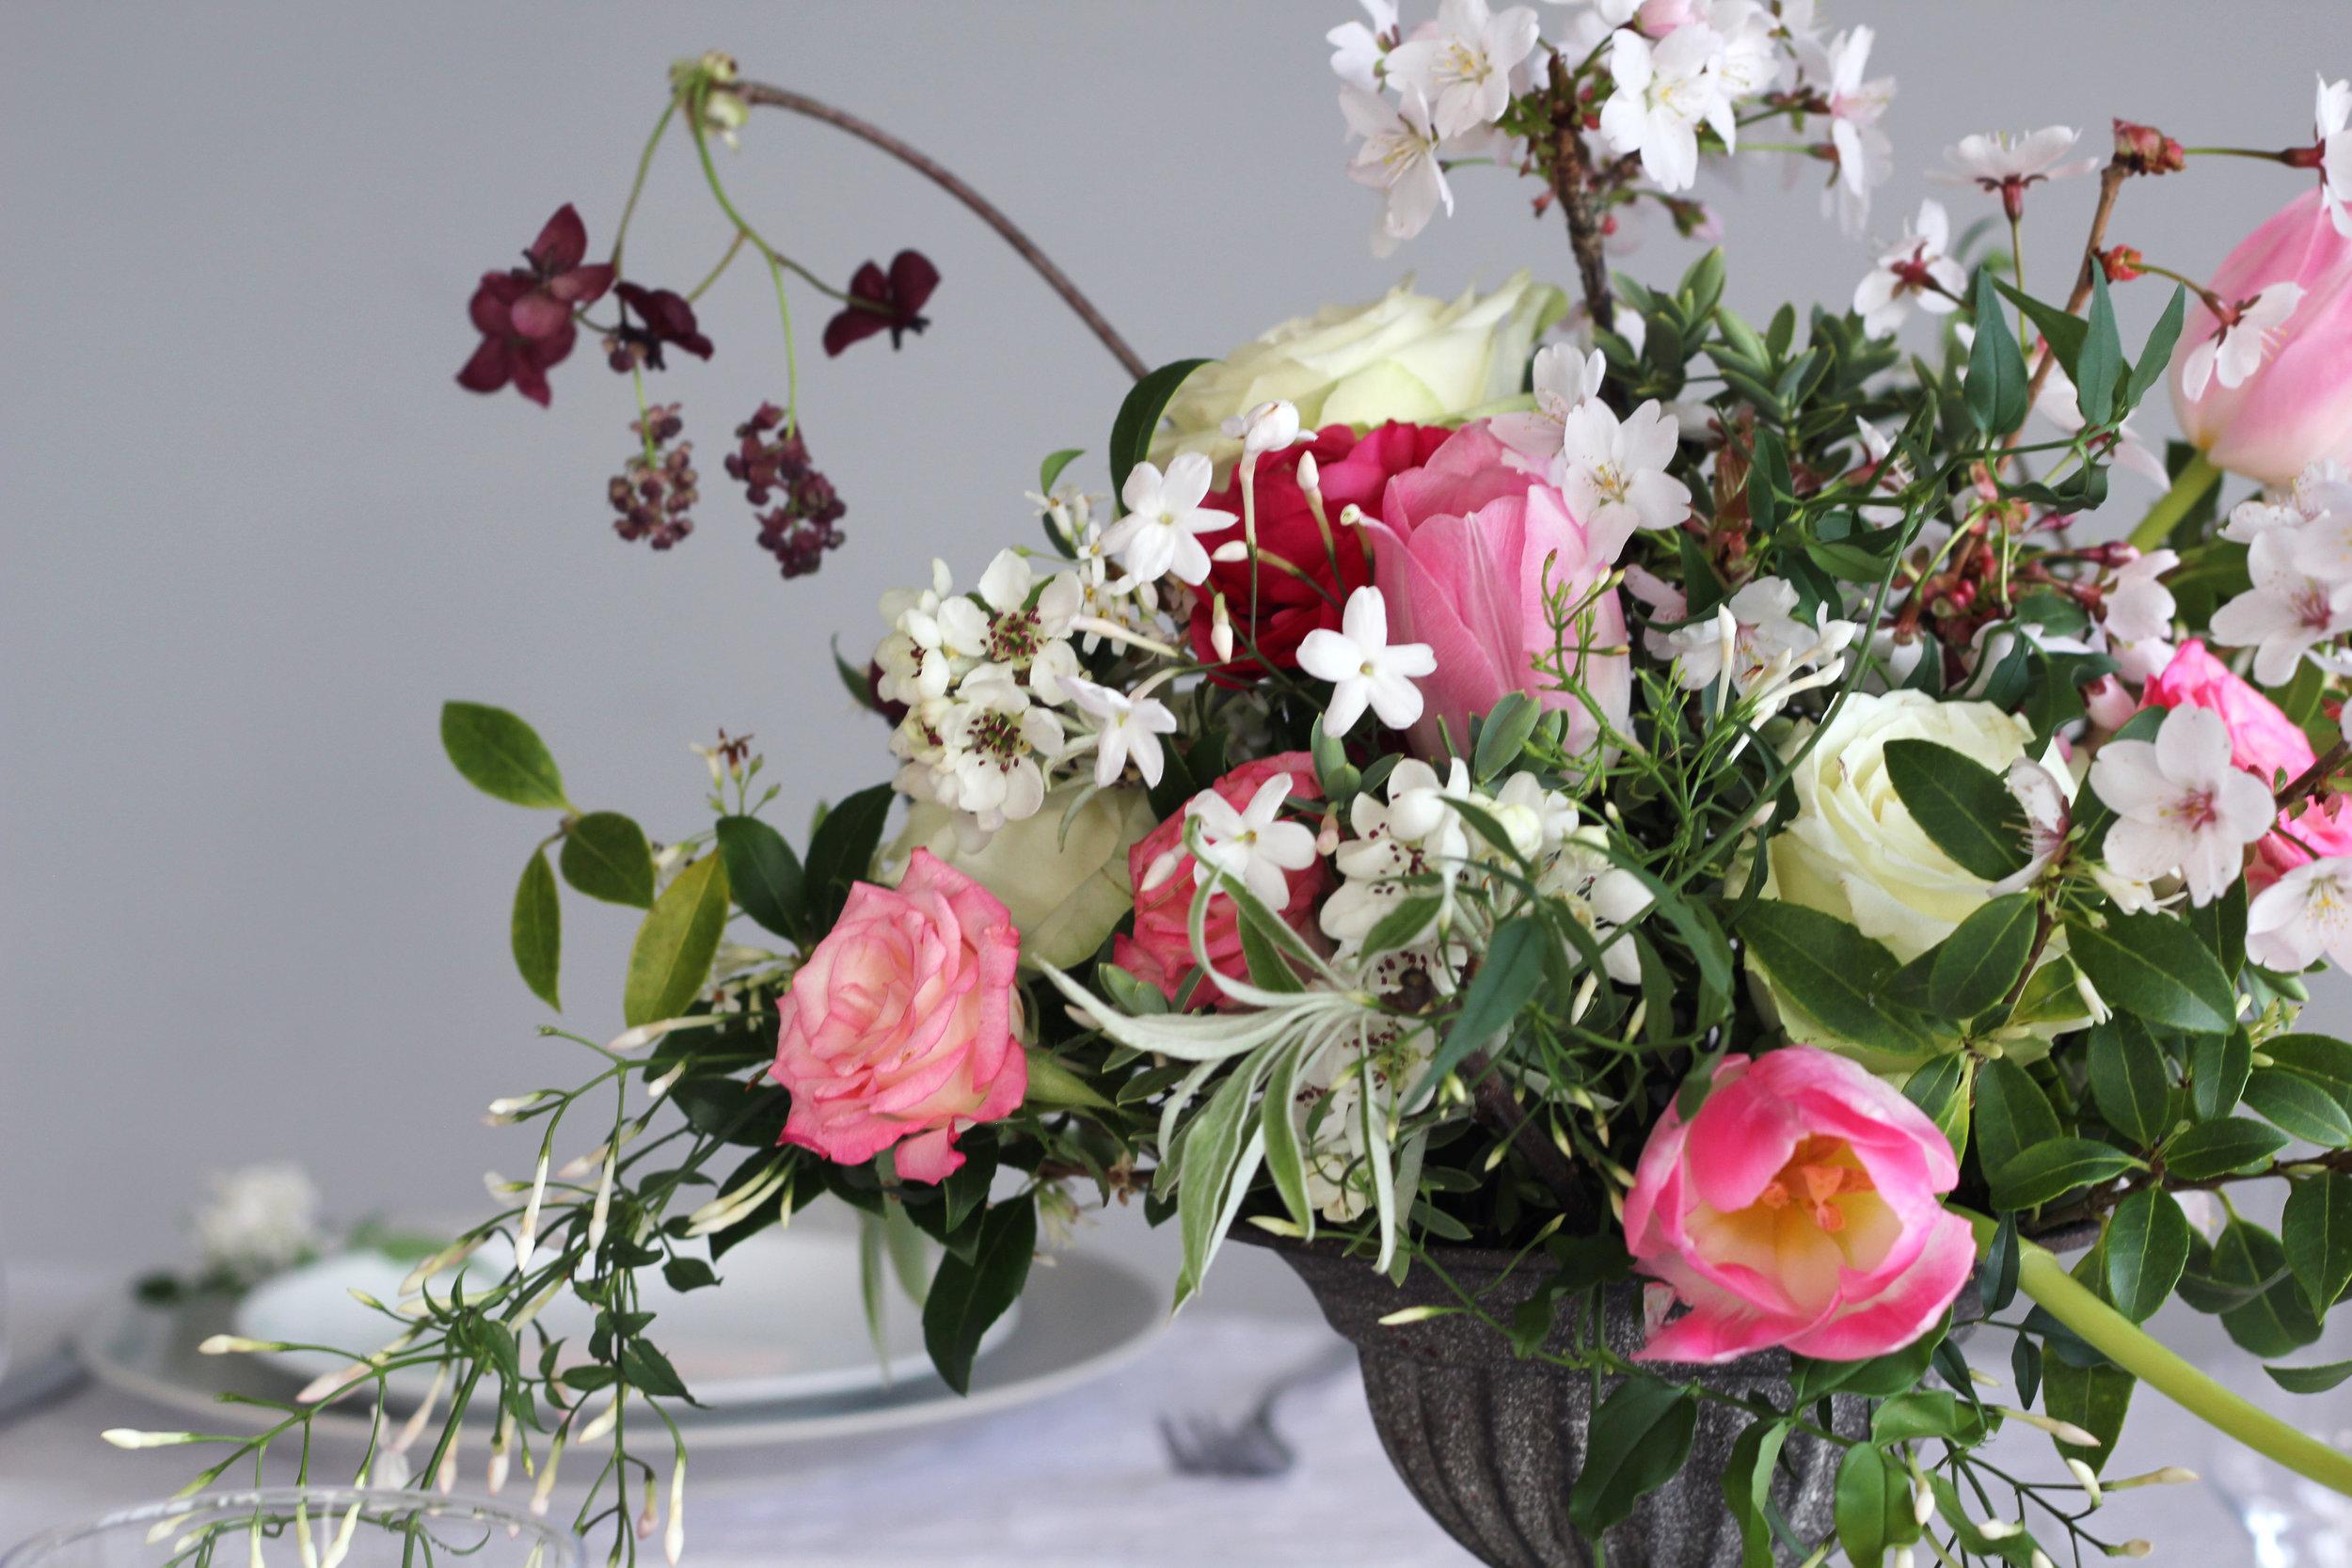 Callie-Pettigrew-Springtime-Wedding-16.jpg